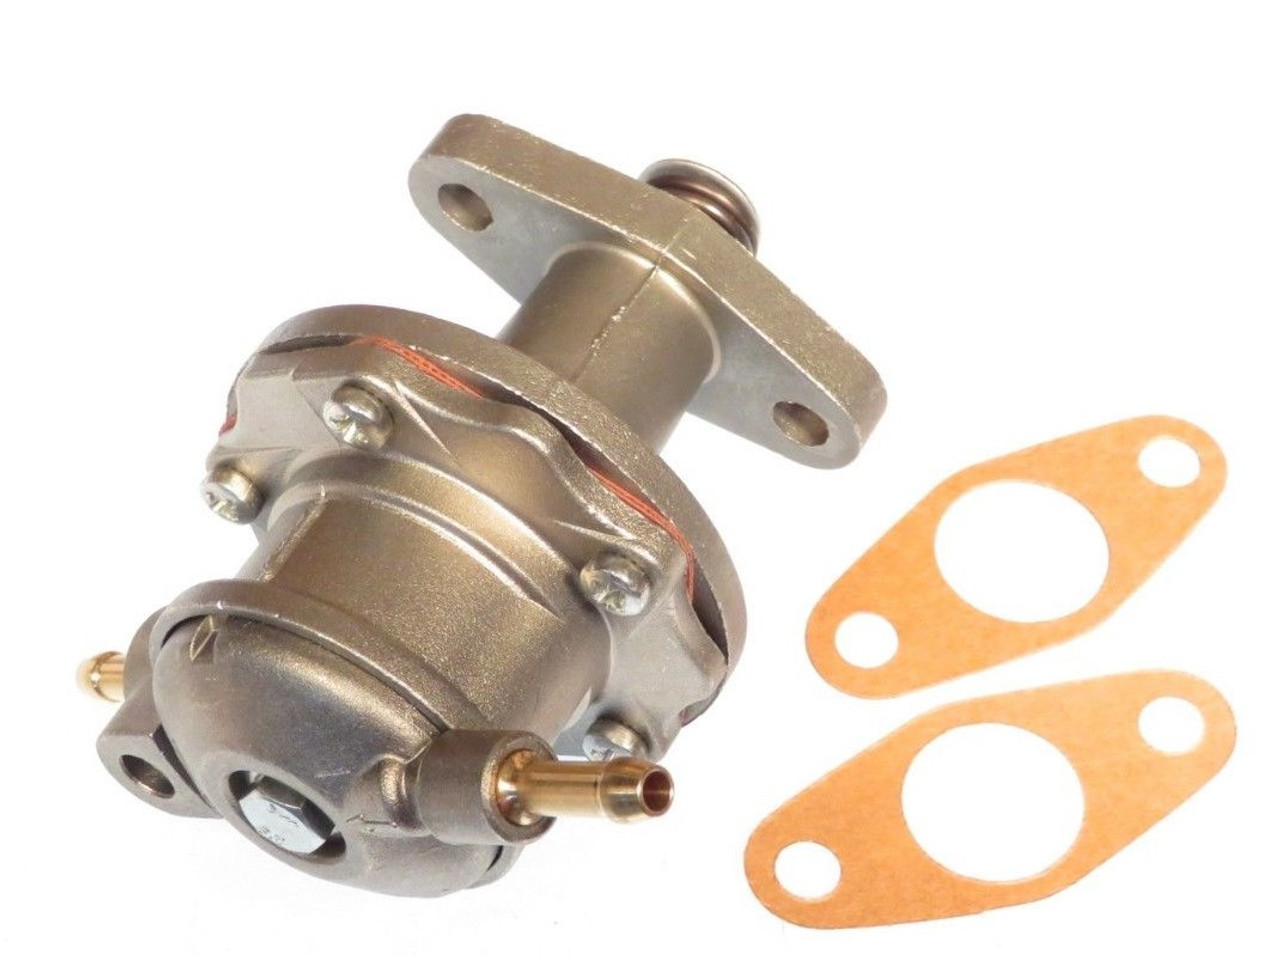 Mechanical Fuel Pump EPC Brand Fits Saab 95 96 & Sonett FP14284